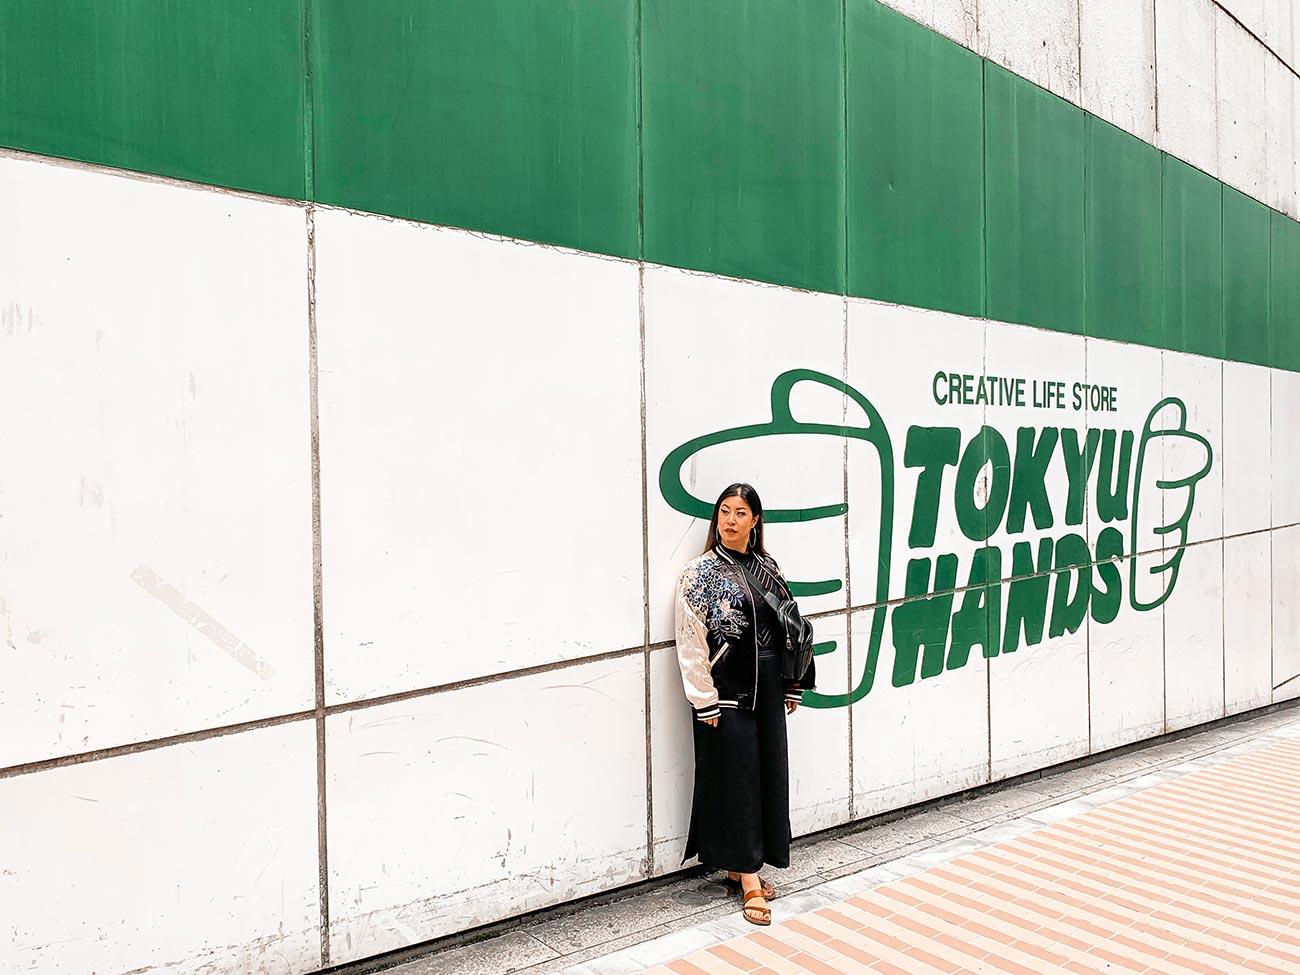 Tokyo souvenirs - Tokyu Hands